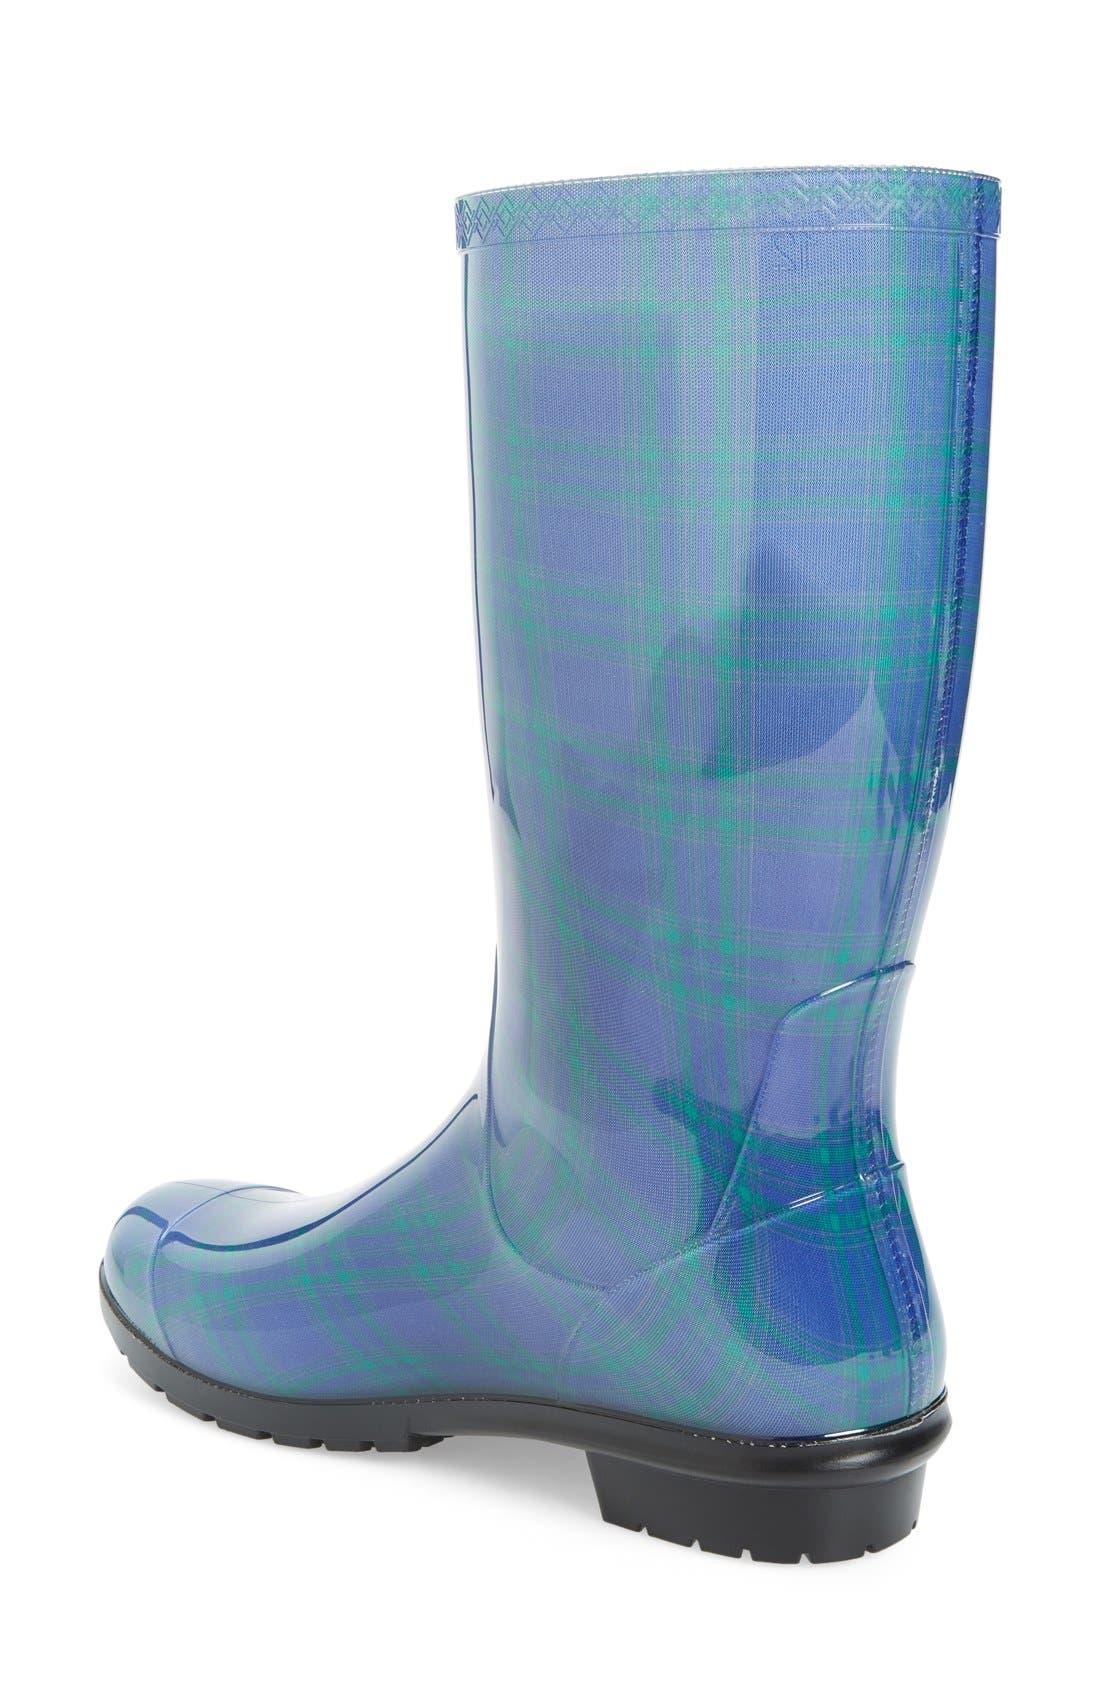 Alternate Image 2  - UGG® 'Shaye' Genuine Shearling Lined Waterproof Mid-Calf Rain Boot (Women)